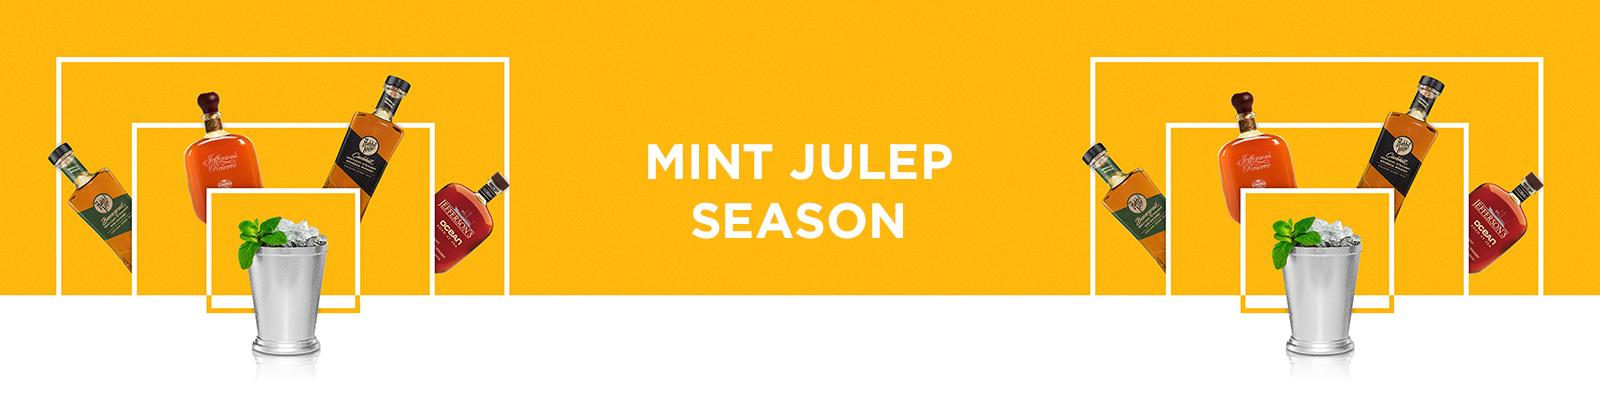 Mint Julep Season